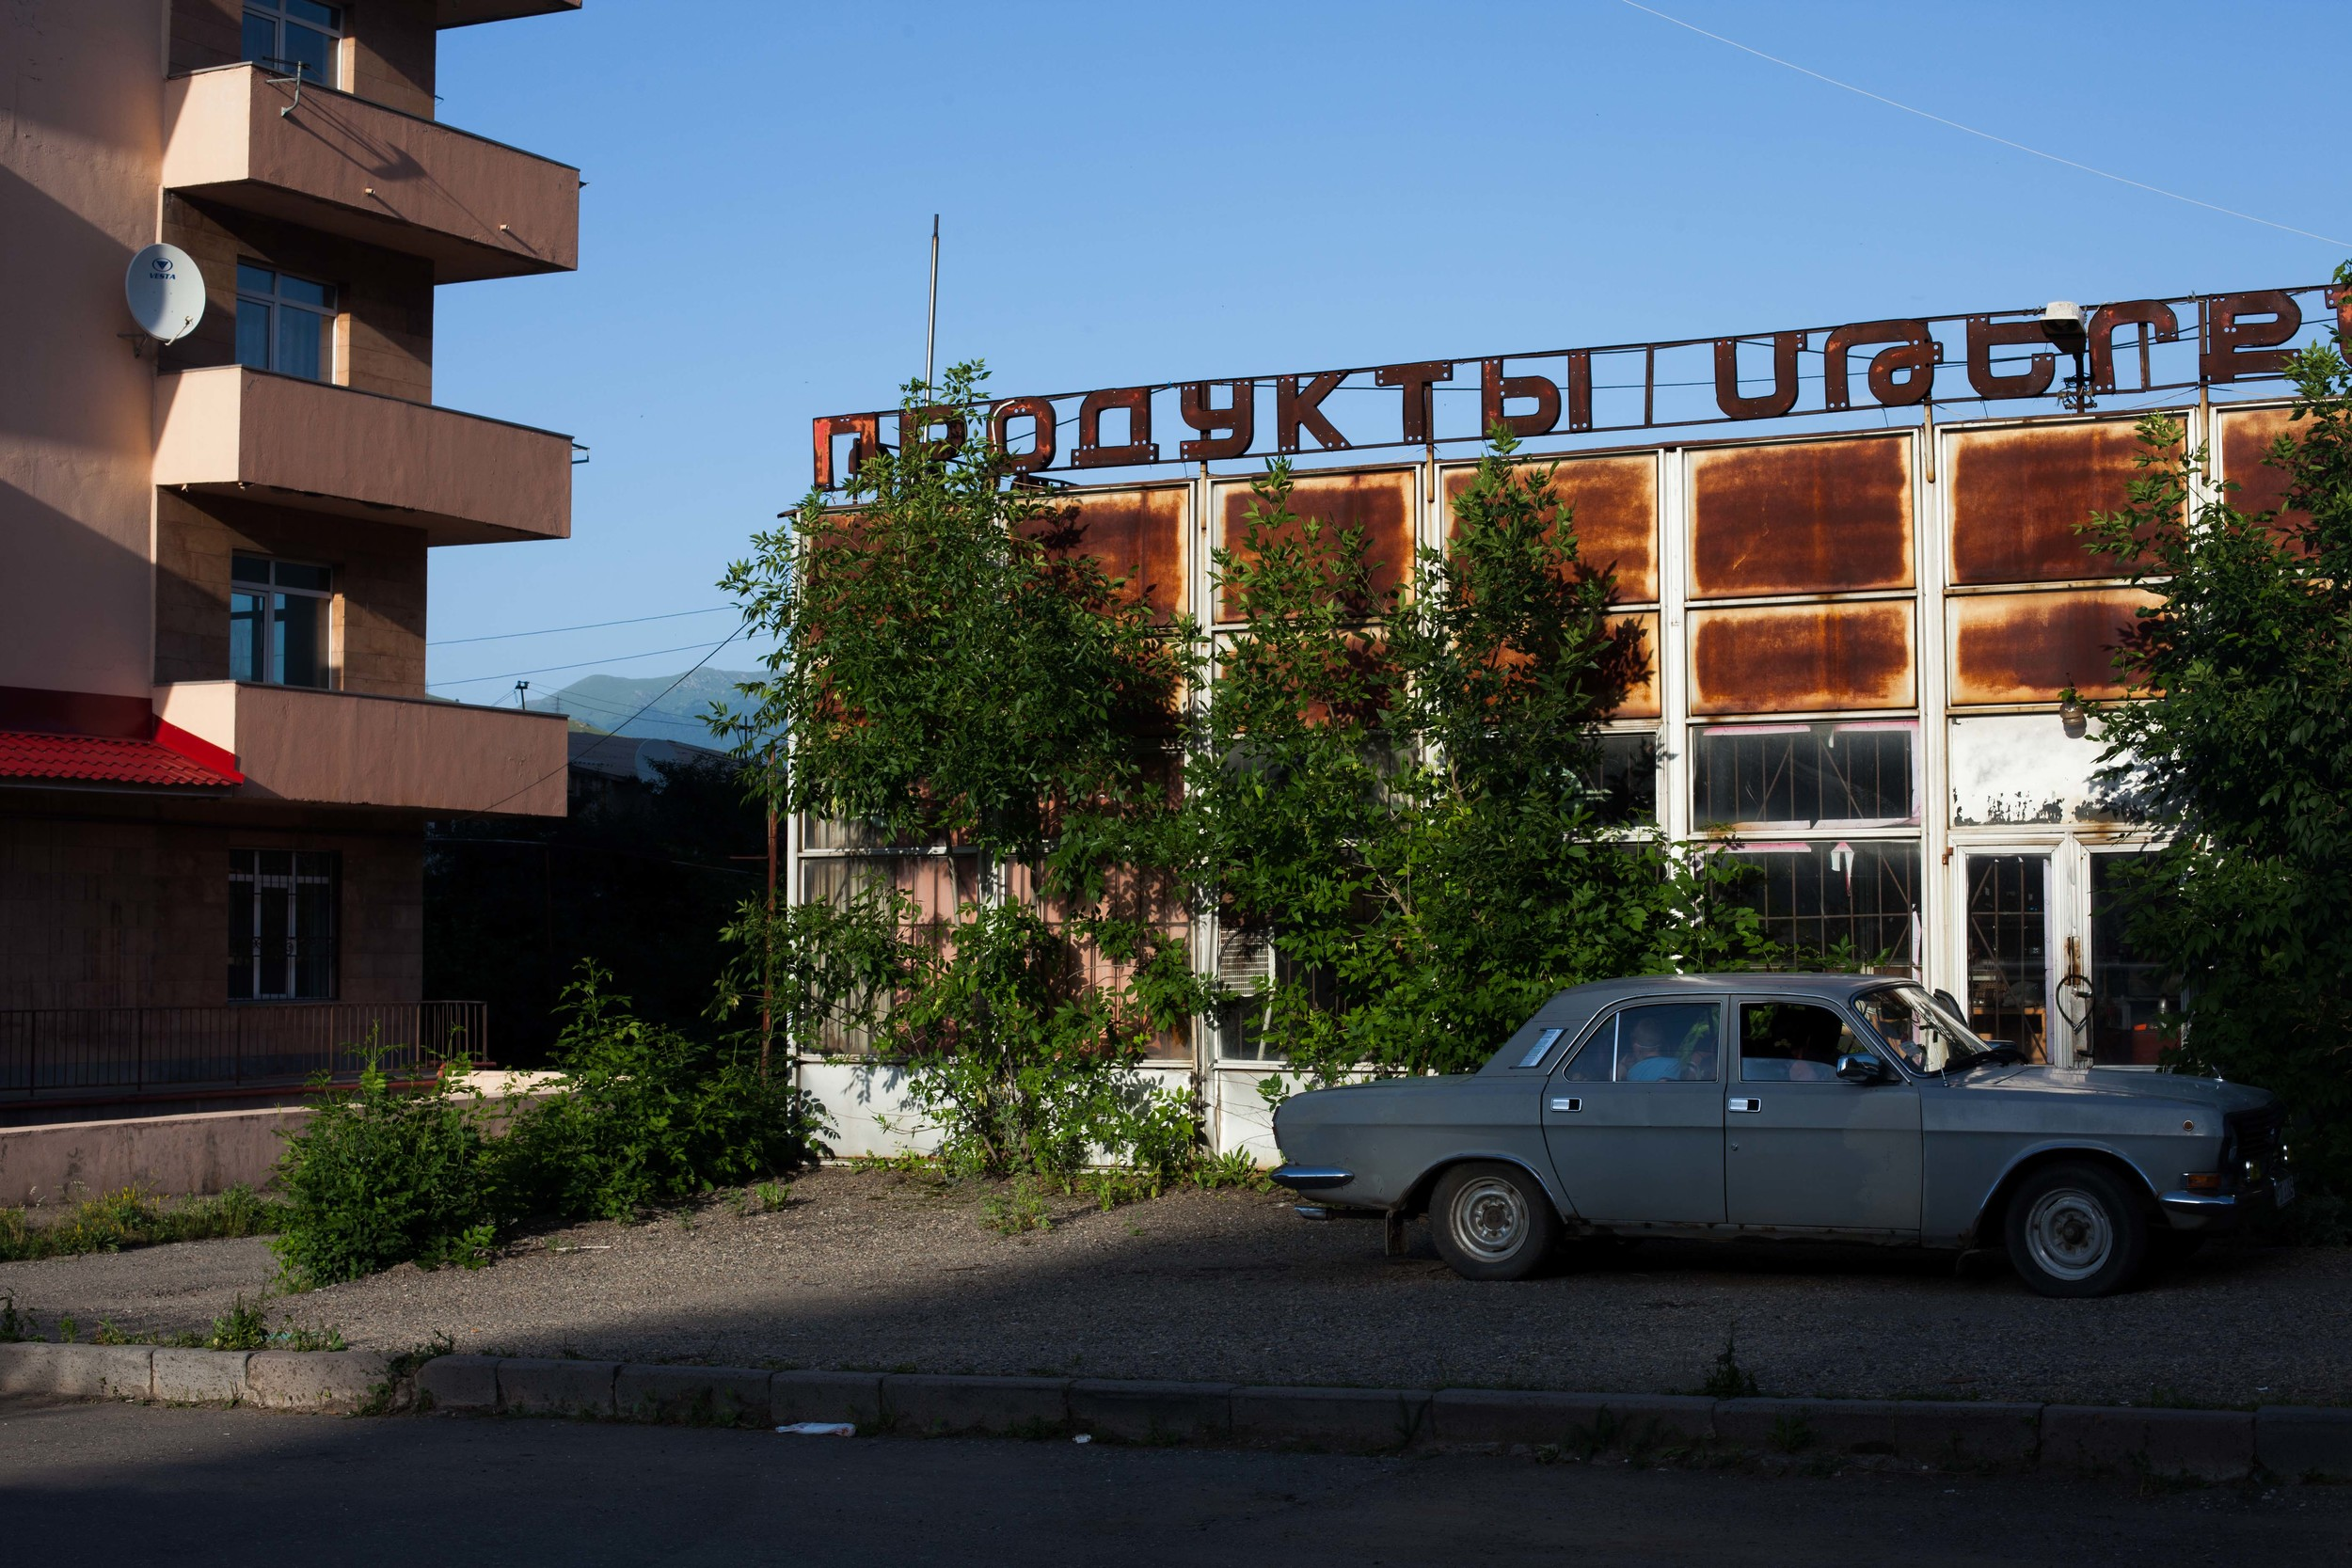 Street scene in Vanadzor, Armenia, the capital of the Lori Province.